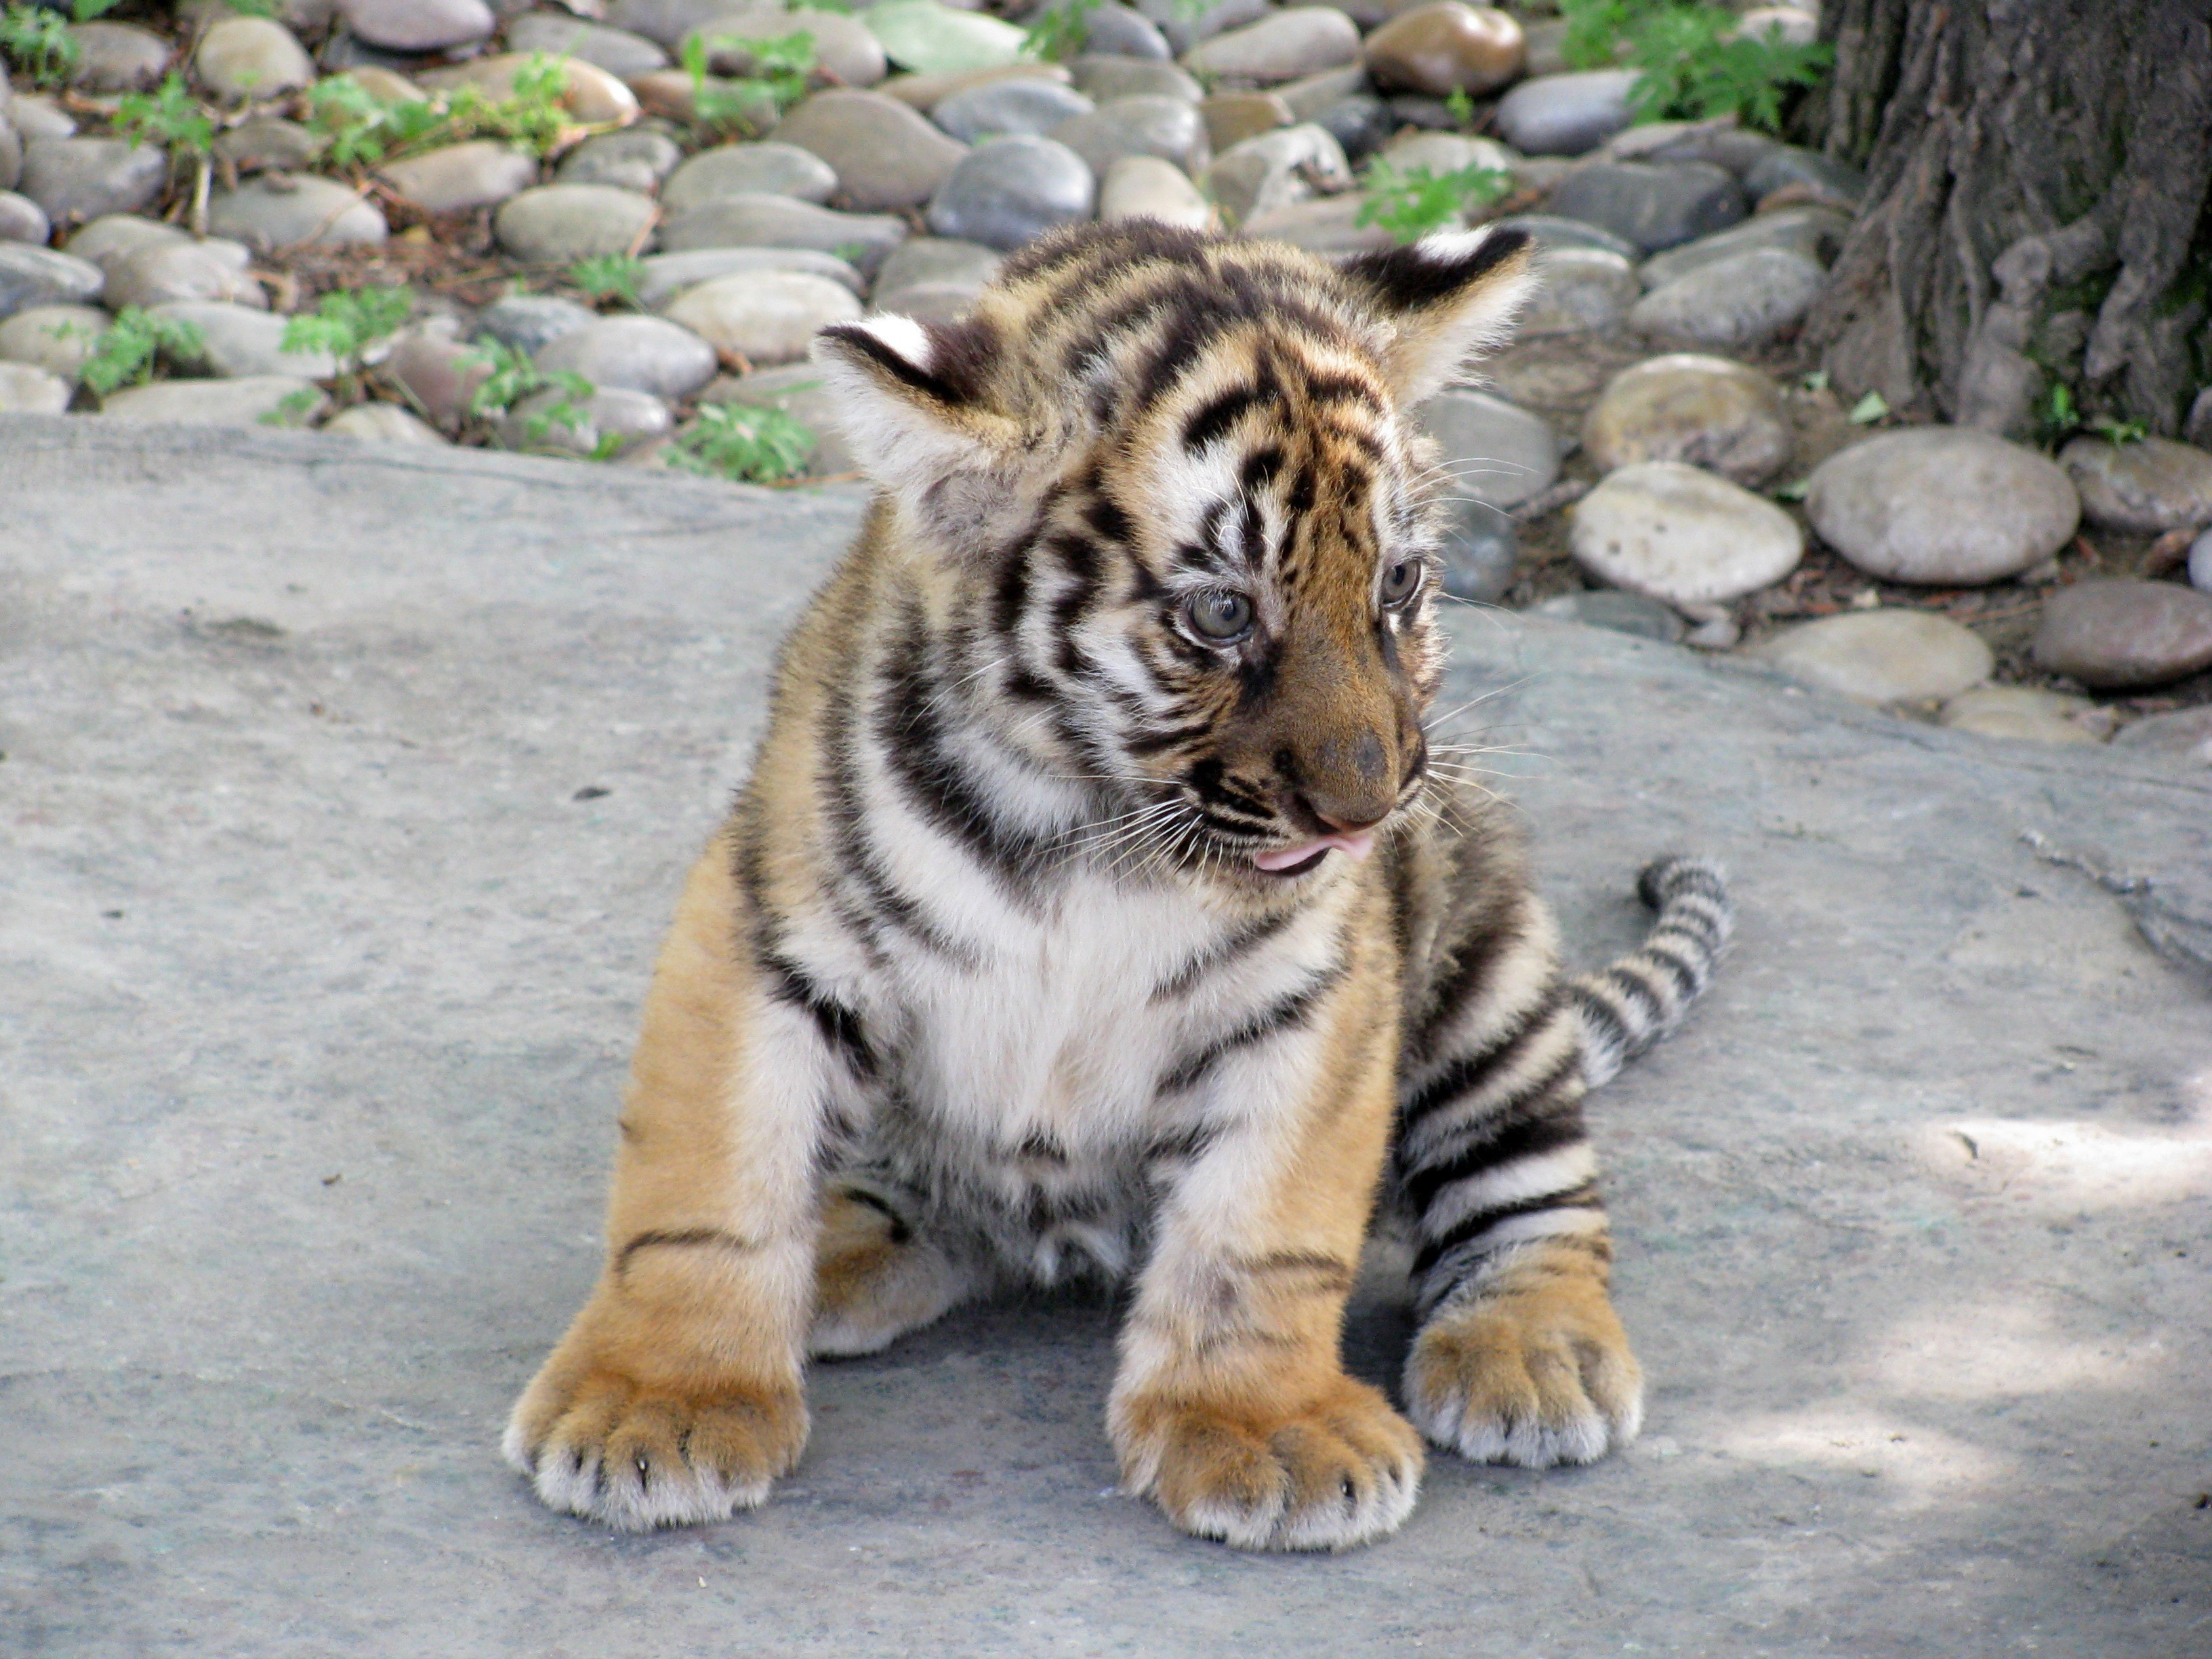 http://cdn.oboi7.com/35210927f42e50e4d630ca0e1ce4c2f536a65717/zhivotnye-tigry.jpg